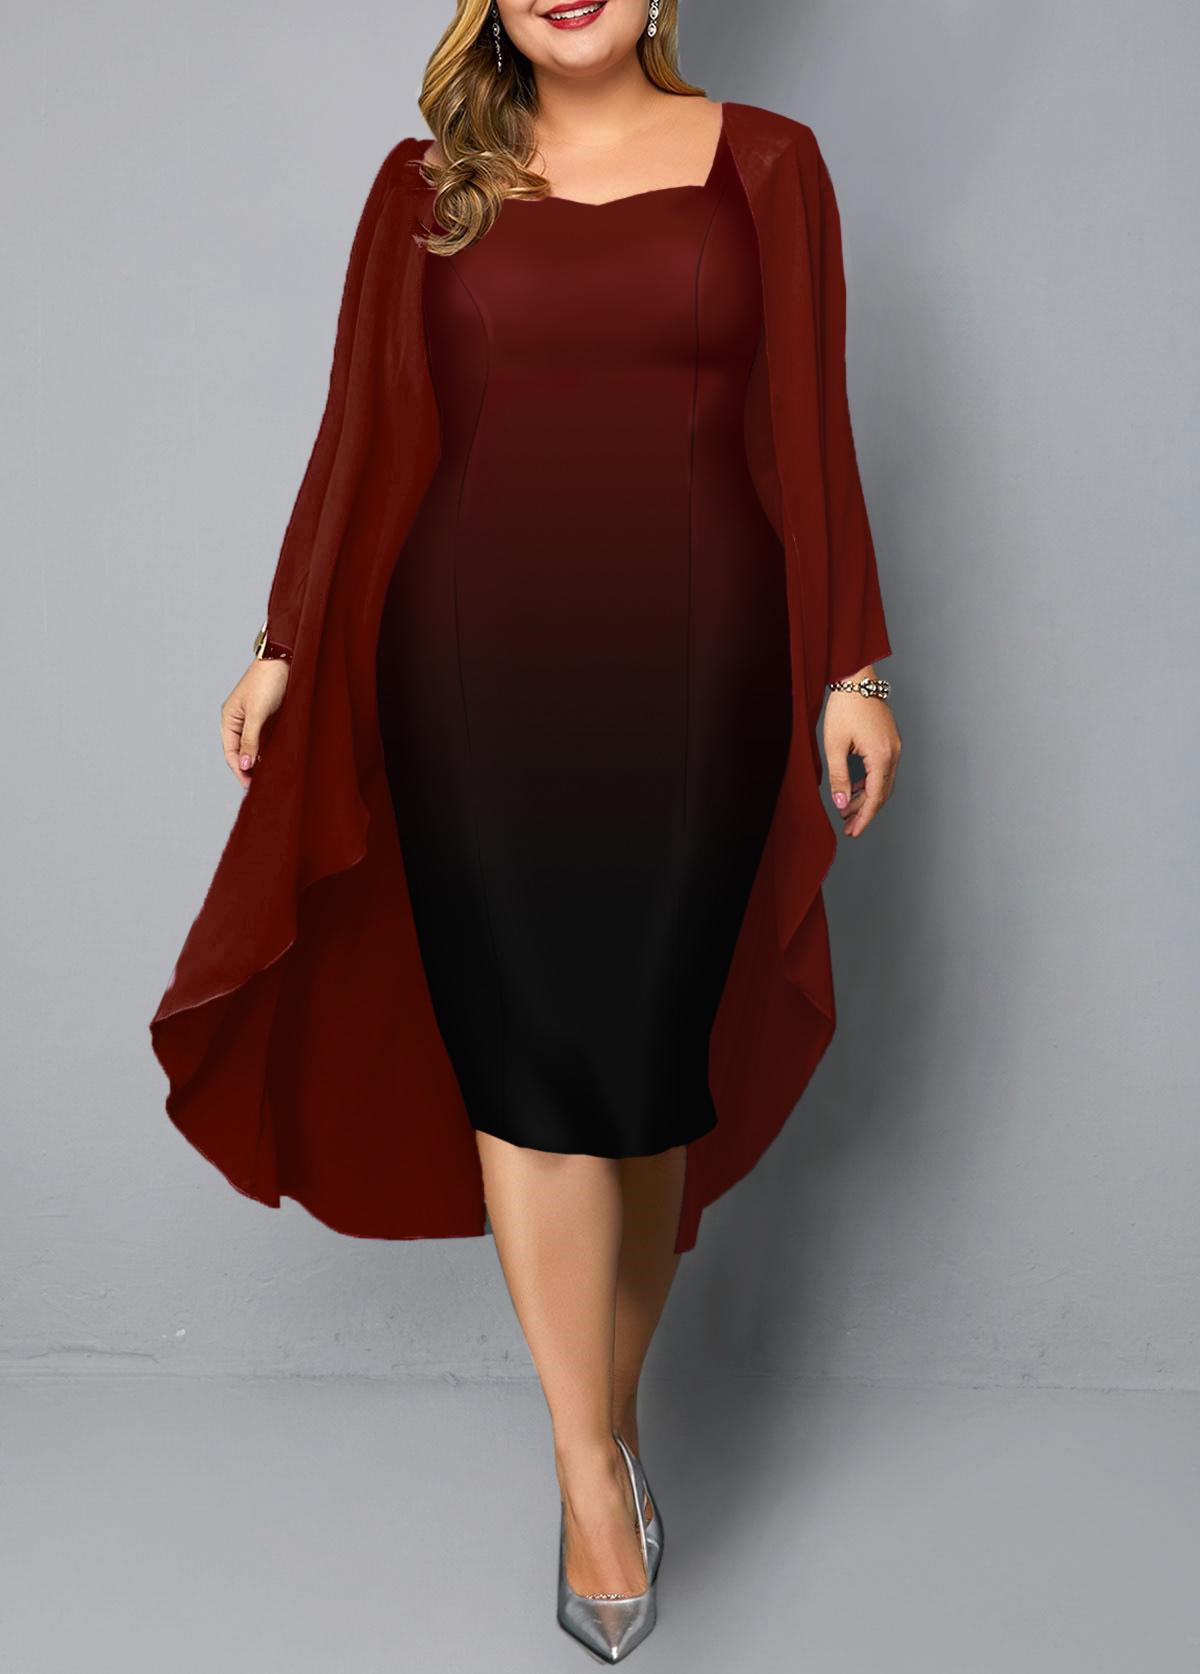 Red Chiffon Cardigan and Gradient Plus Size Dress